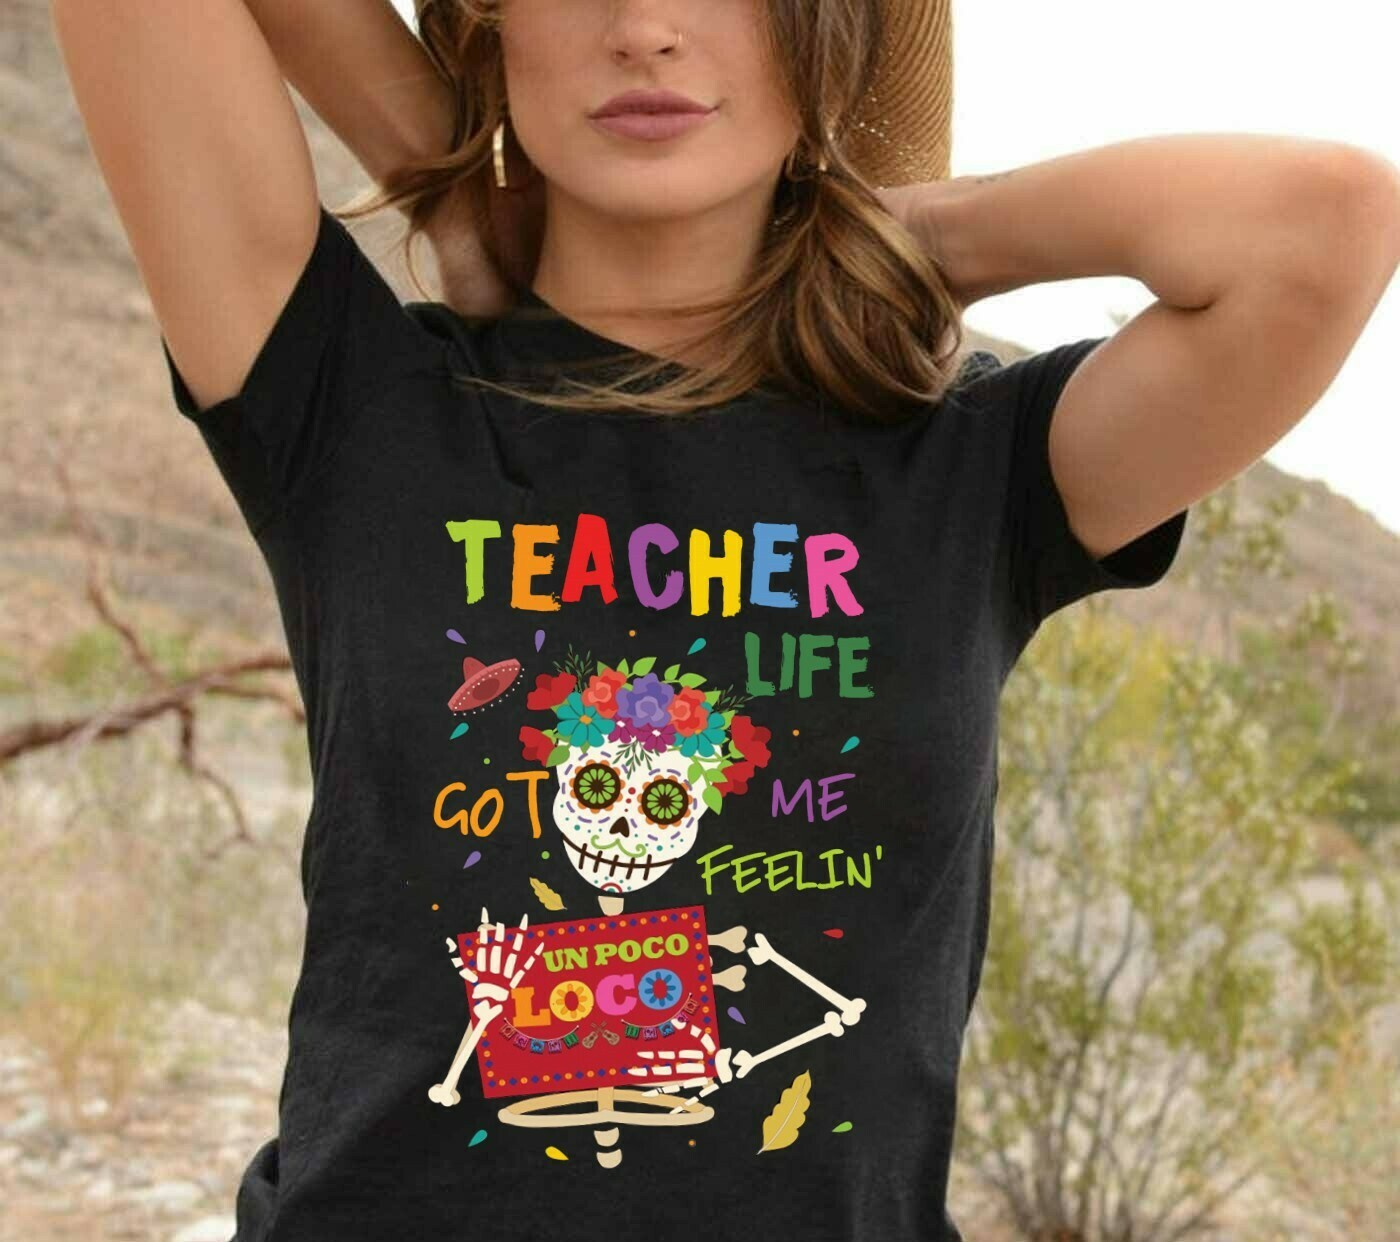 Skeleton Teacher Life Got Me Feelin Un Poco Loco Gifts For Teacher TeacherLife Lecture Graduation School Halloween T-Shirt Long Sleeve Sweatshirt Hoodie Jolly Family Gifts